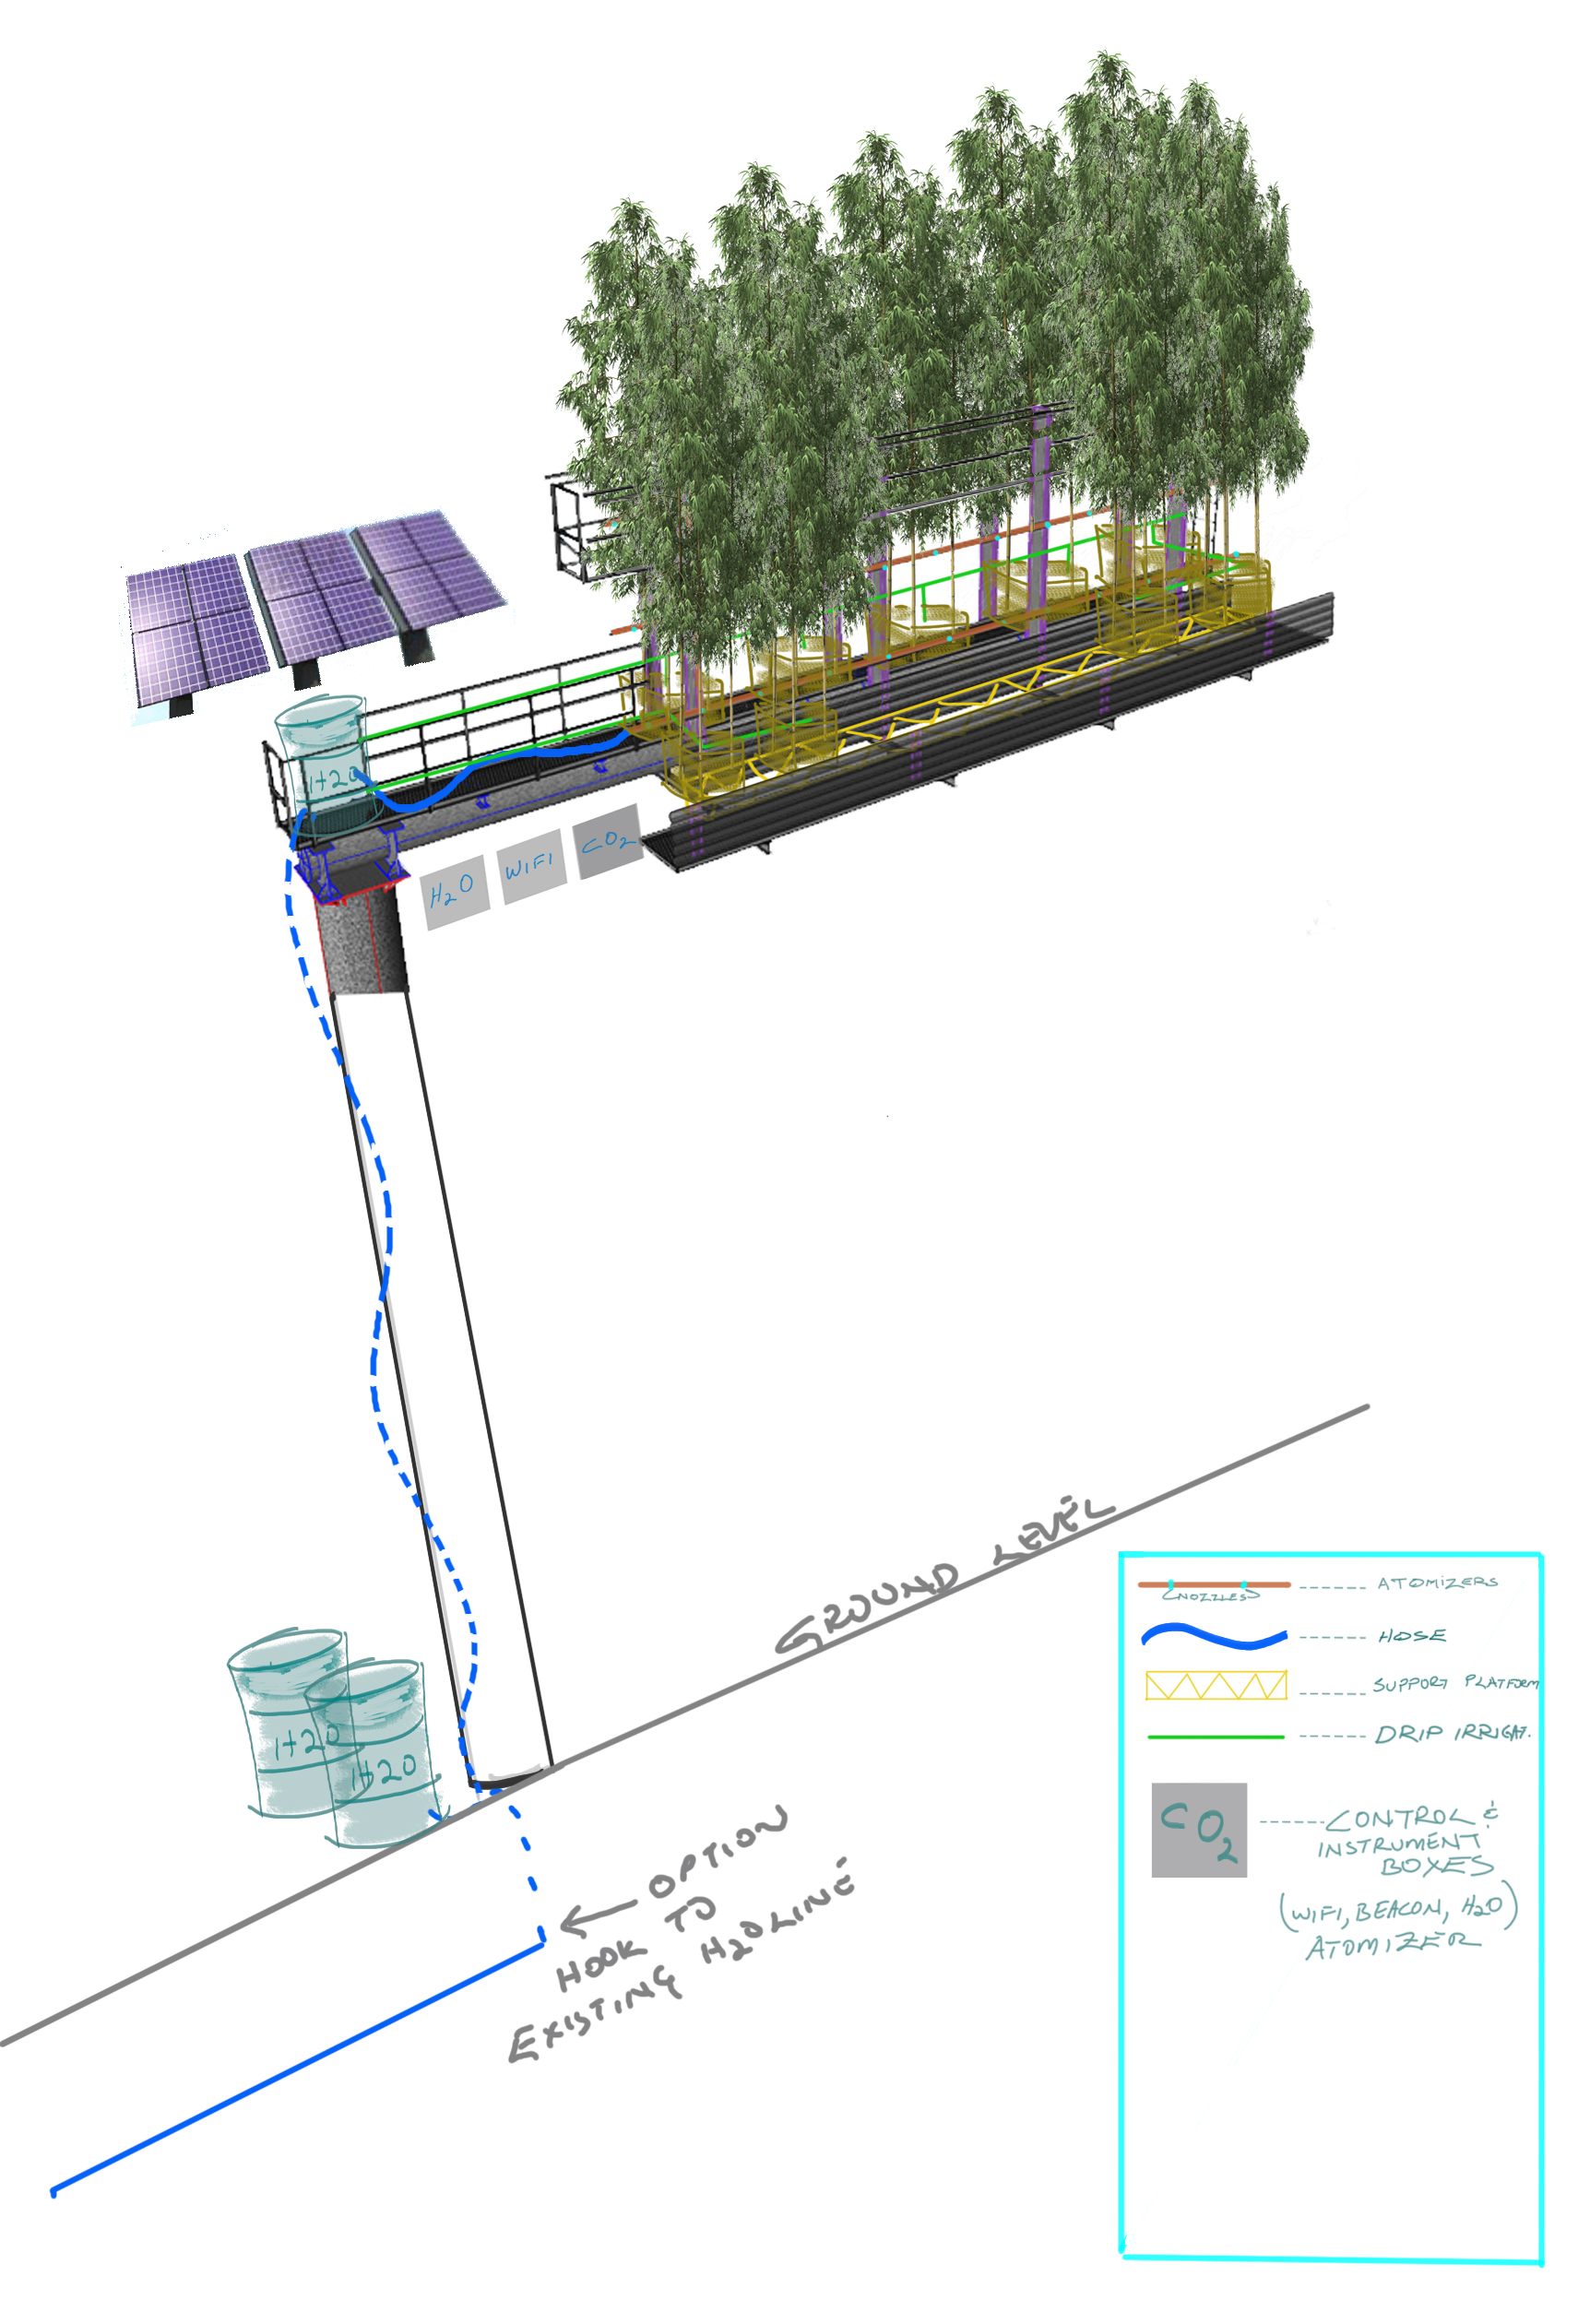 S.E.A.-Studio-Environmental-Architecture-David-Hertz-FAIA-Stephen-Glassman-Open-Air-Los-Angeles-sustainable-regenerative-restorative-green-infrastructure-design-bottle-filling-station-upcycle-billboard-advertising-speculative-art-sculpture-bamboo-2.jpg